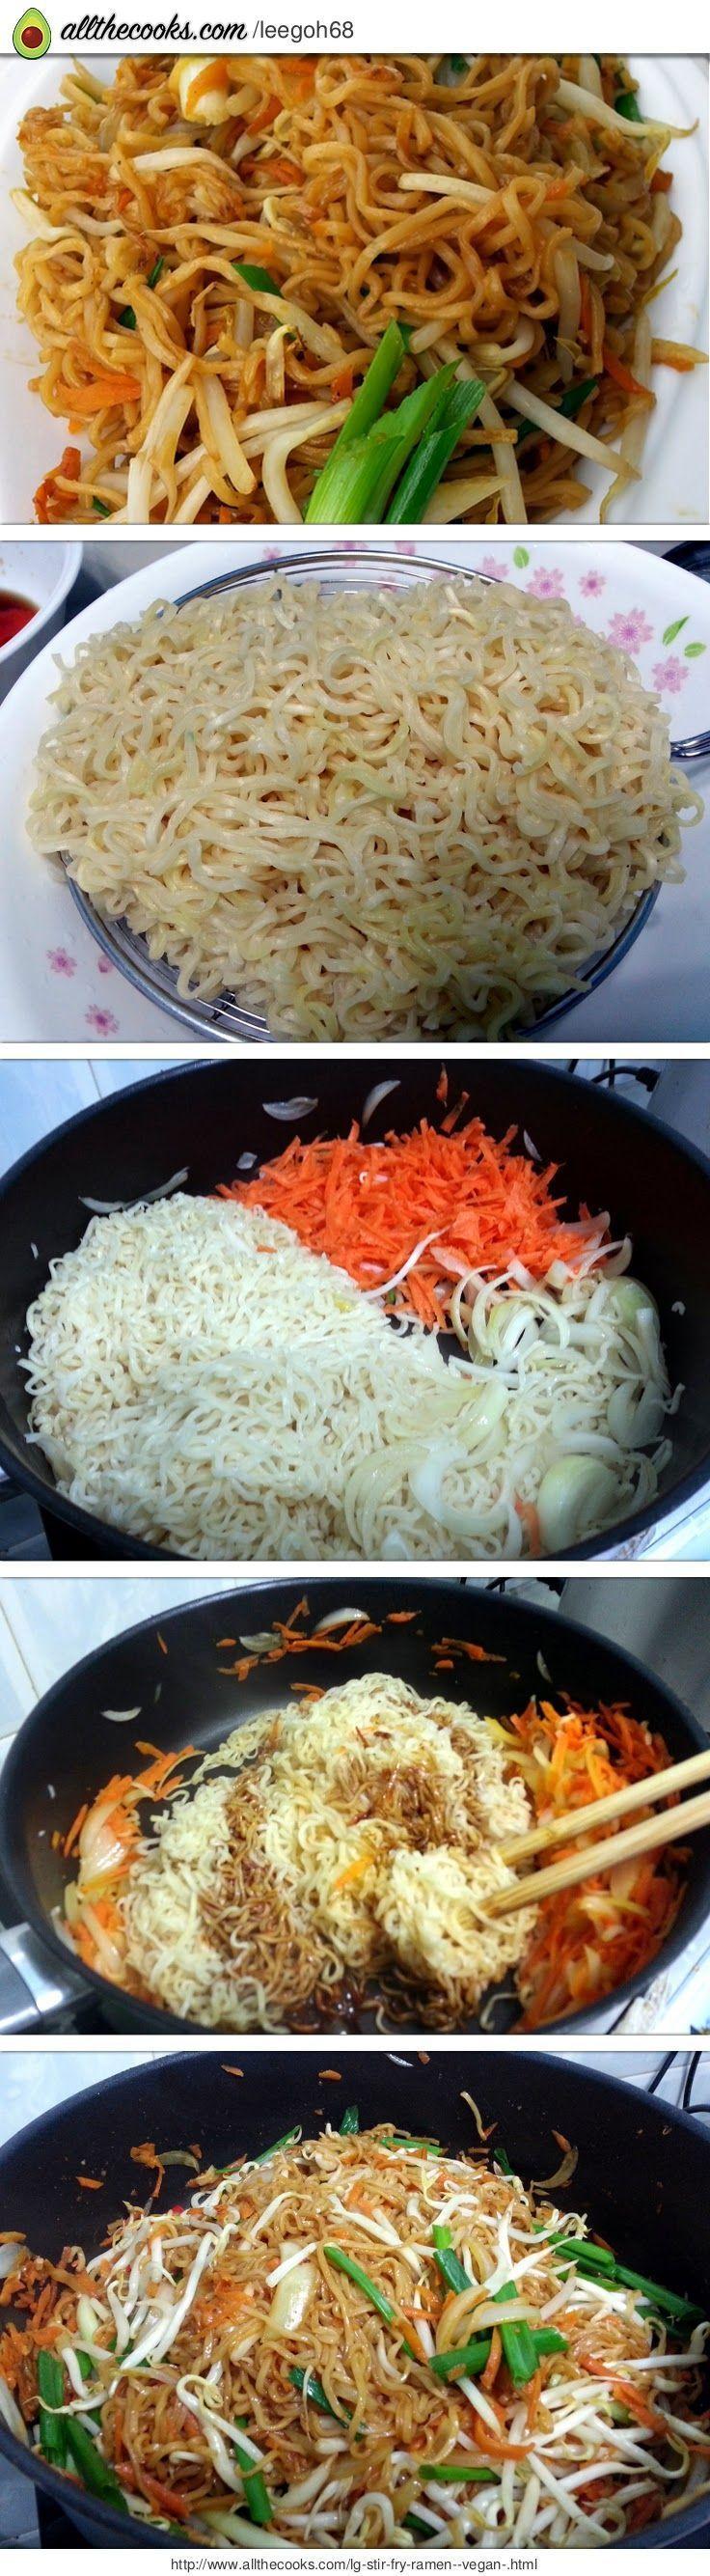 Ramen Noodle Stir Fry.